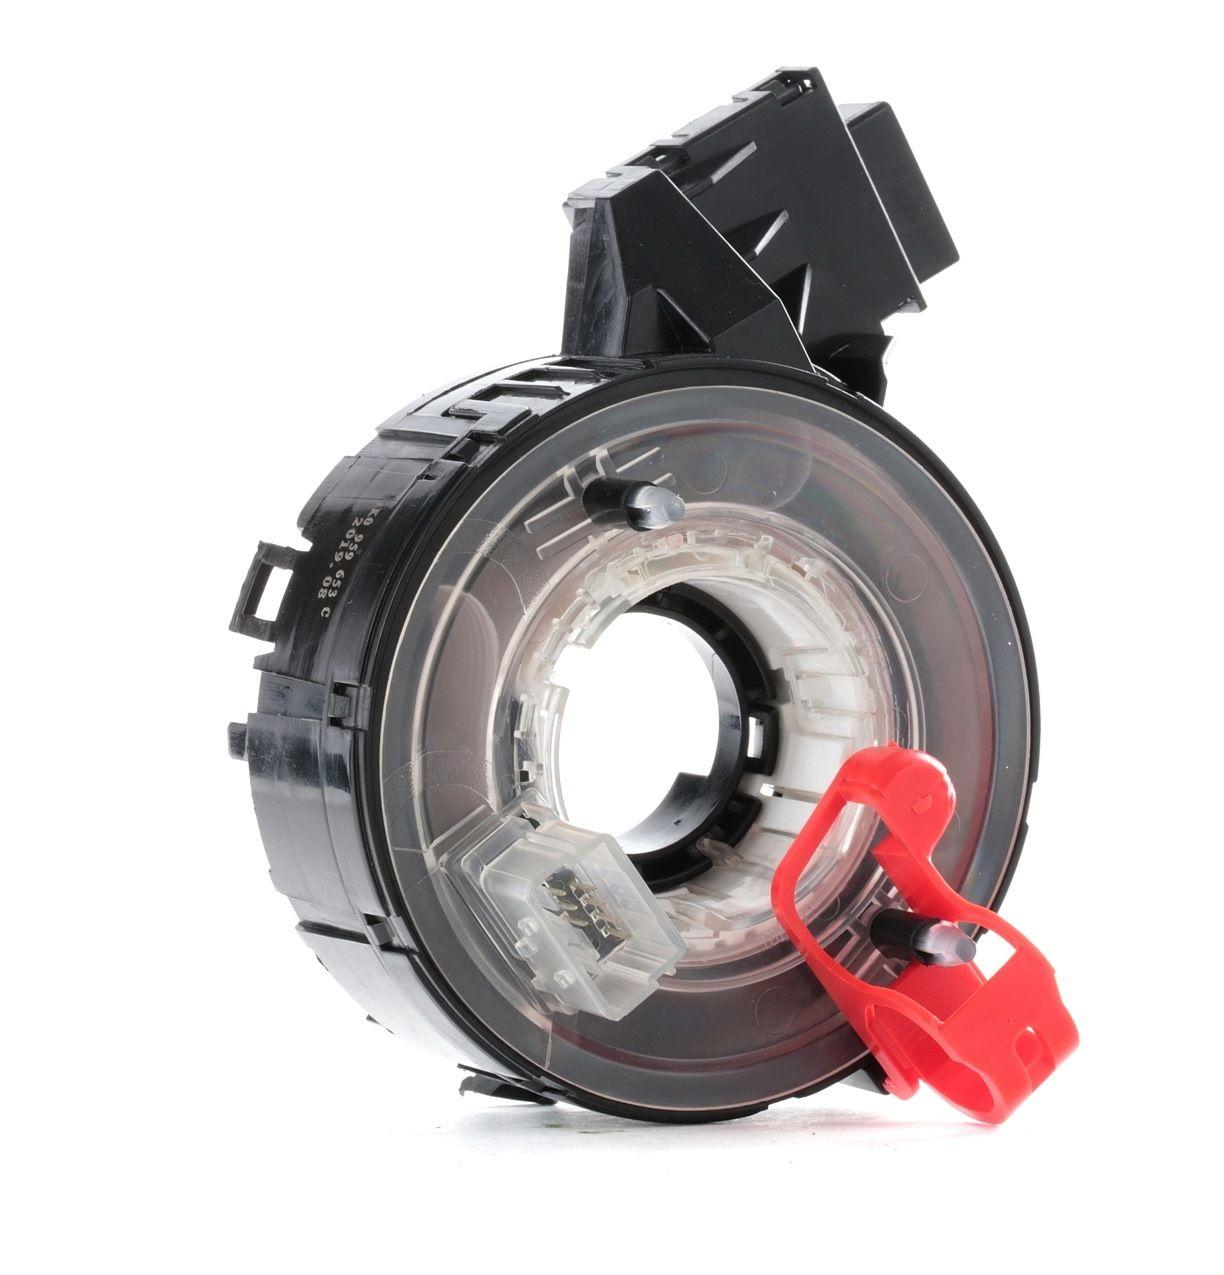 Clockspring, airbag JP GROUP 1189750200 rating